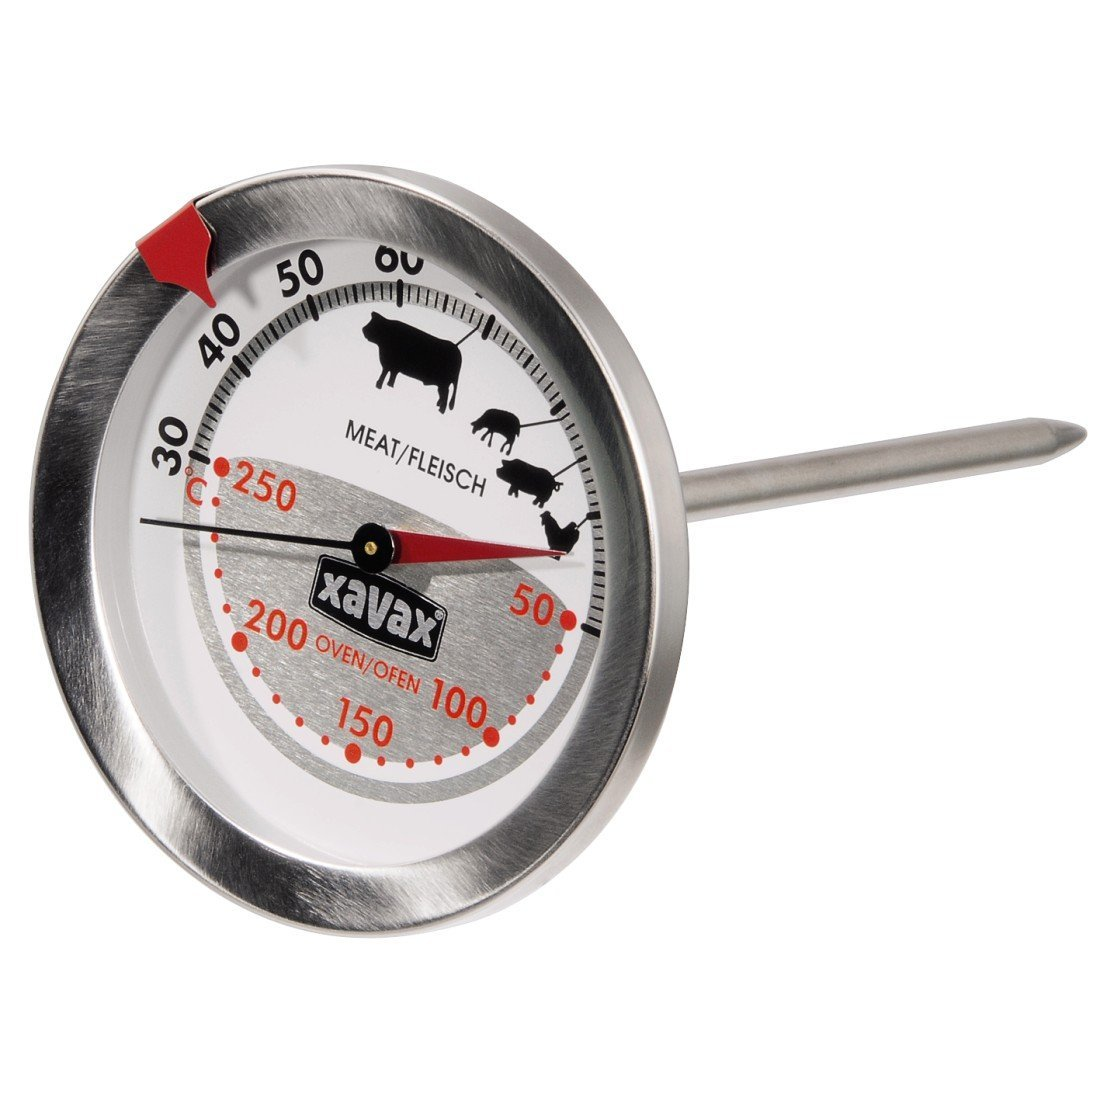 Xavax 2-in-1 Bratenthermometer